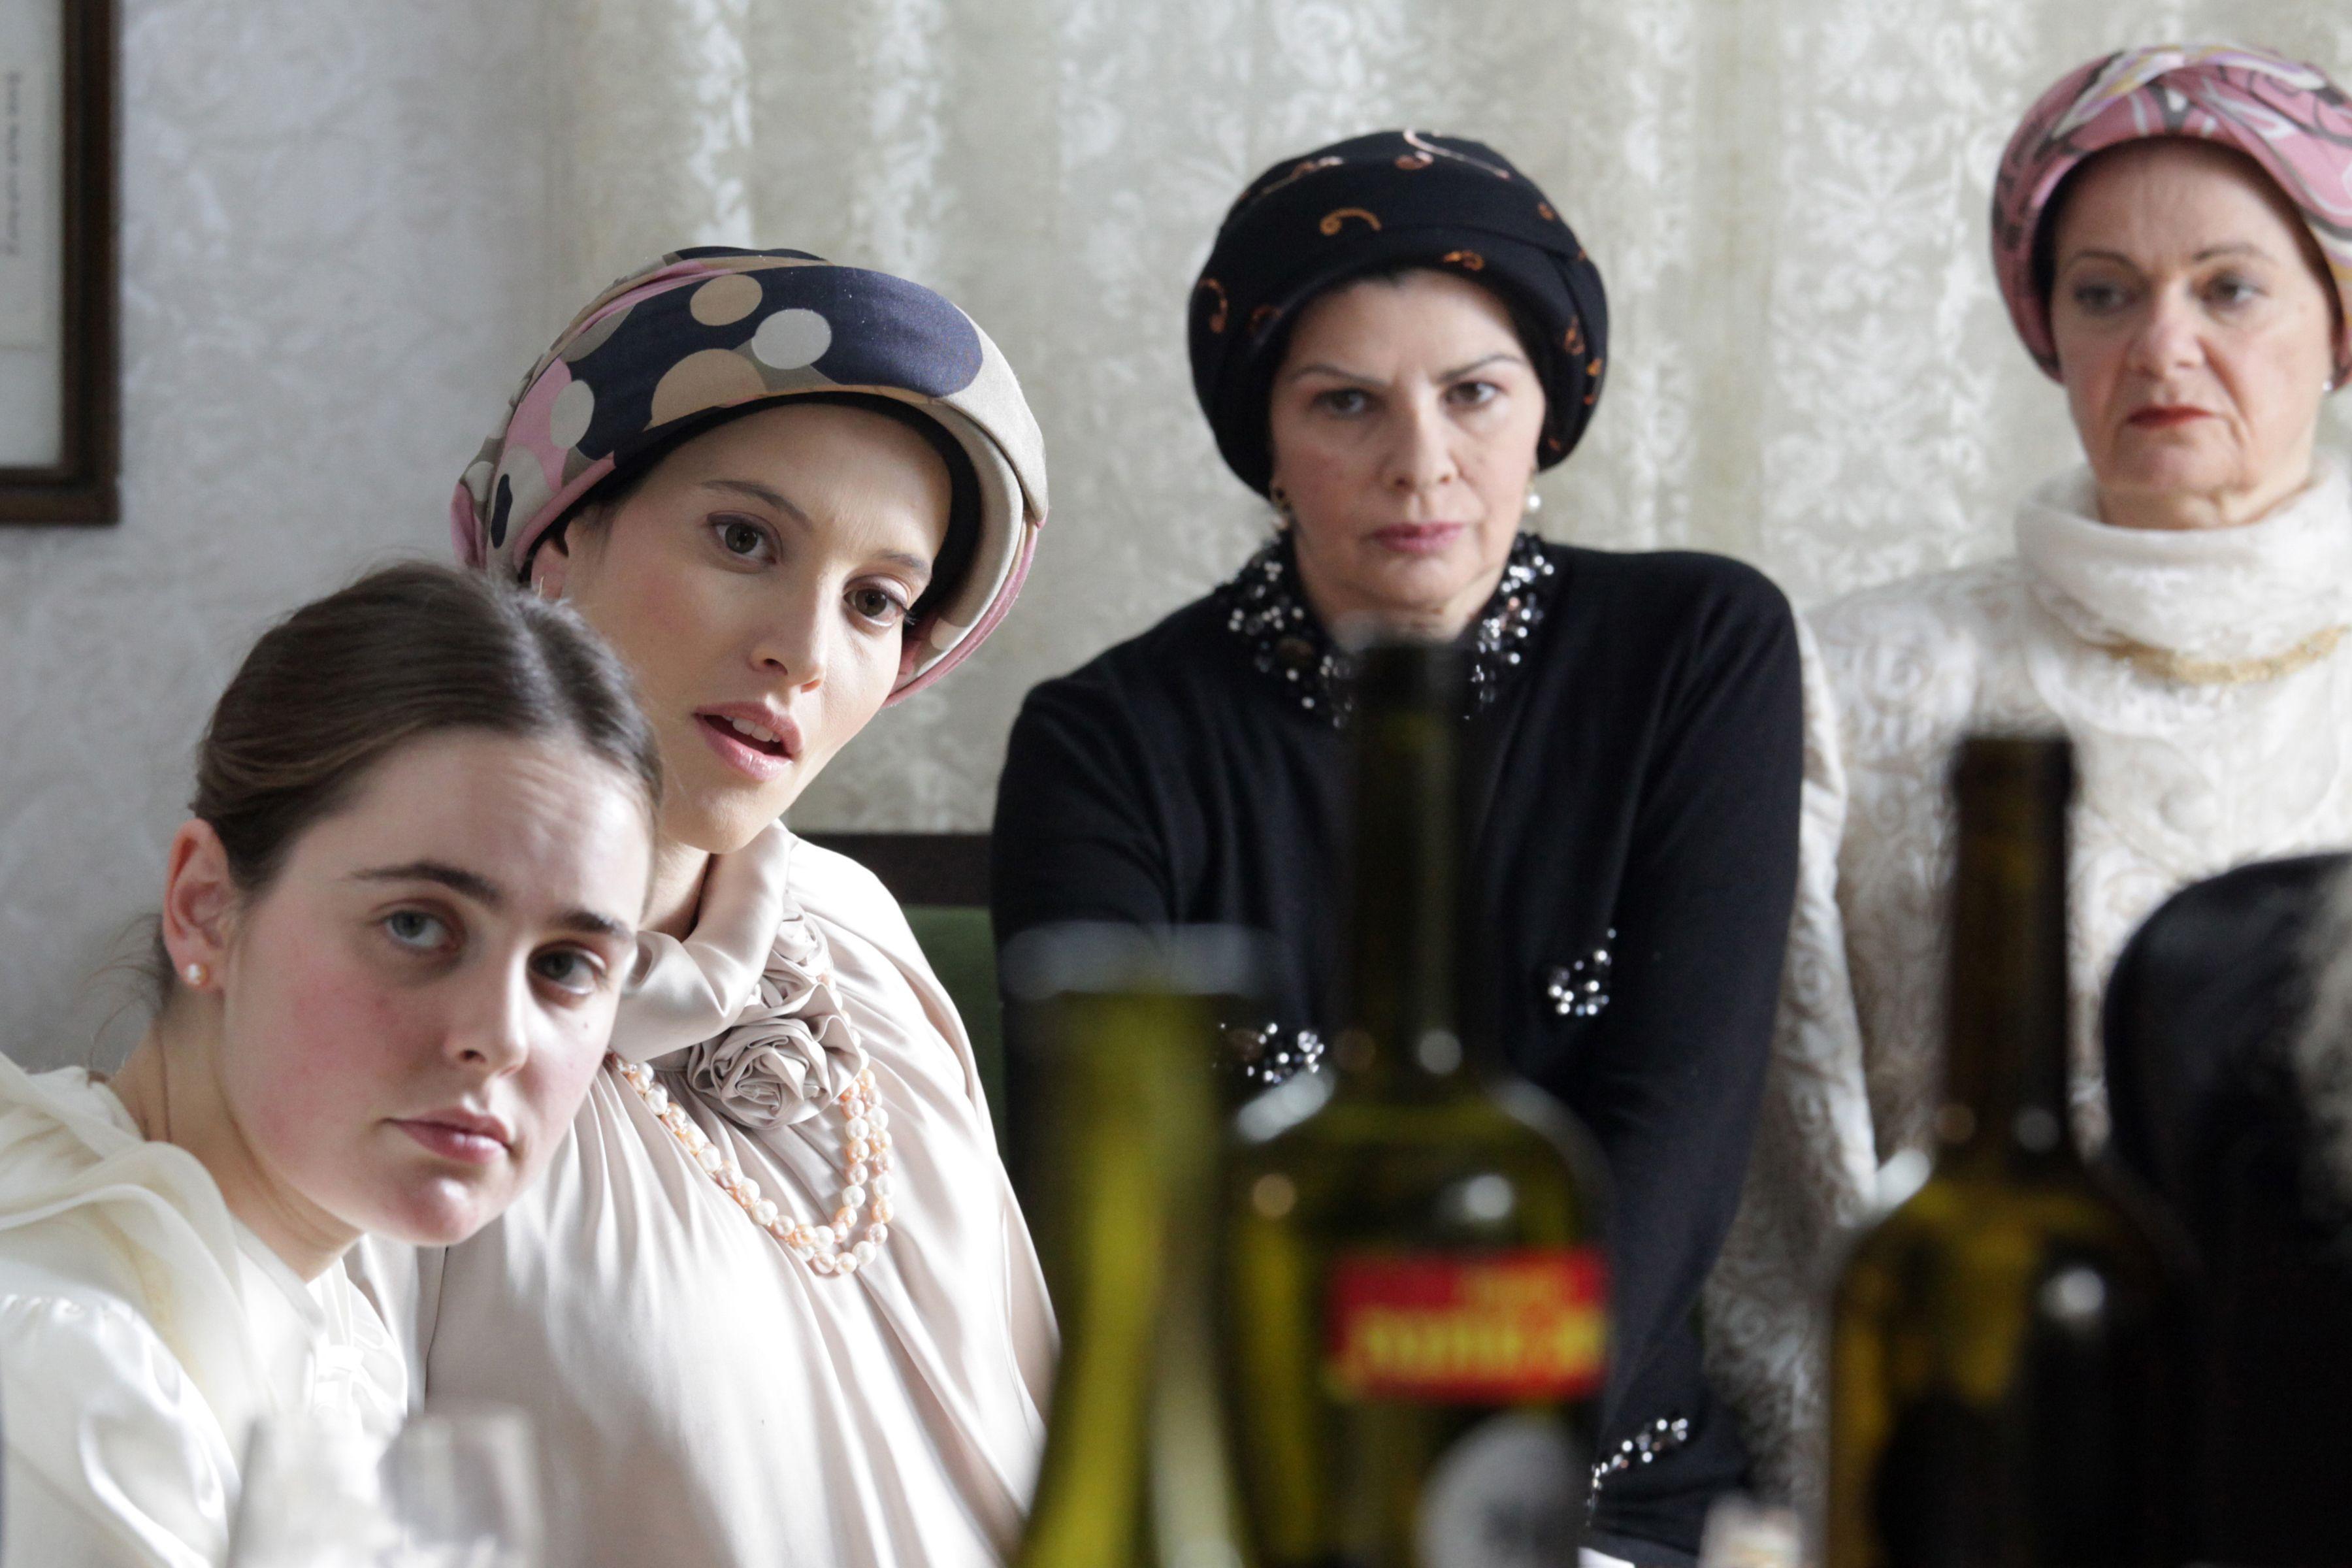 Unique Ultra Orthodox Jewish Women Clothing Women Wear Long Skirts